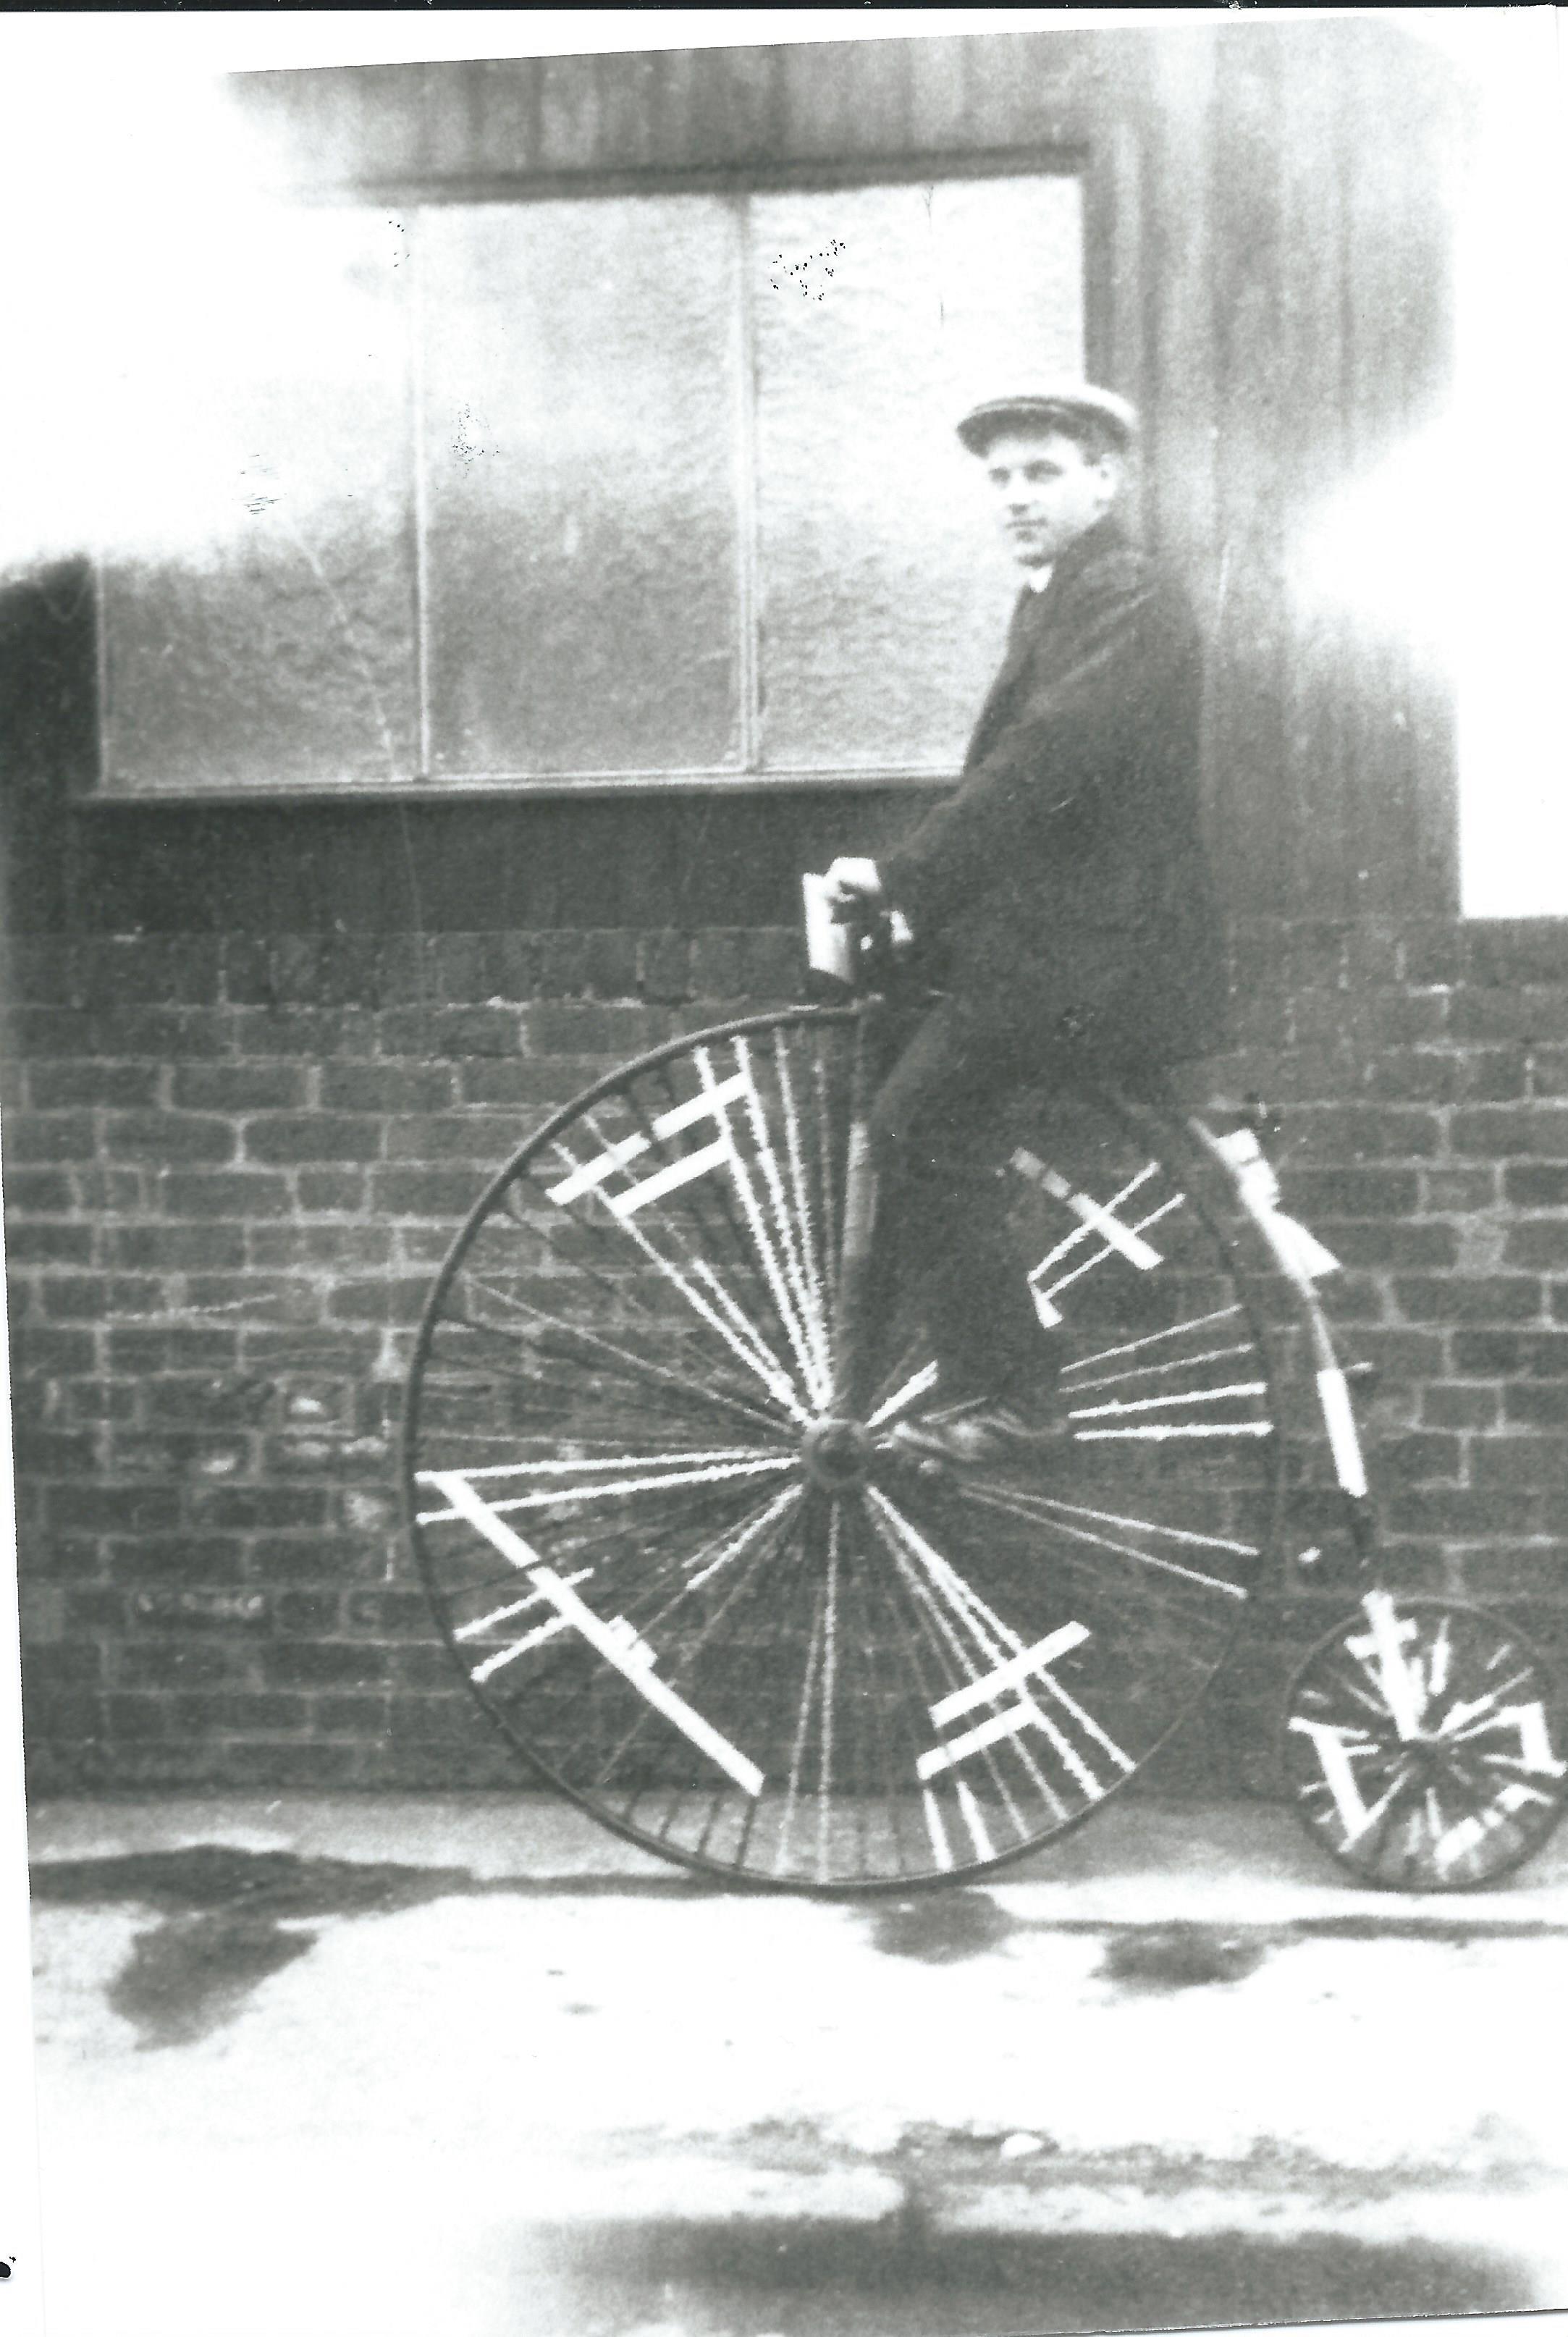 c1417b-clarion-cycling-club-bill-joynes-on-penny-farthing-outsi